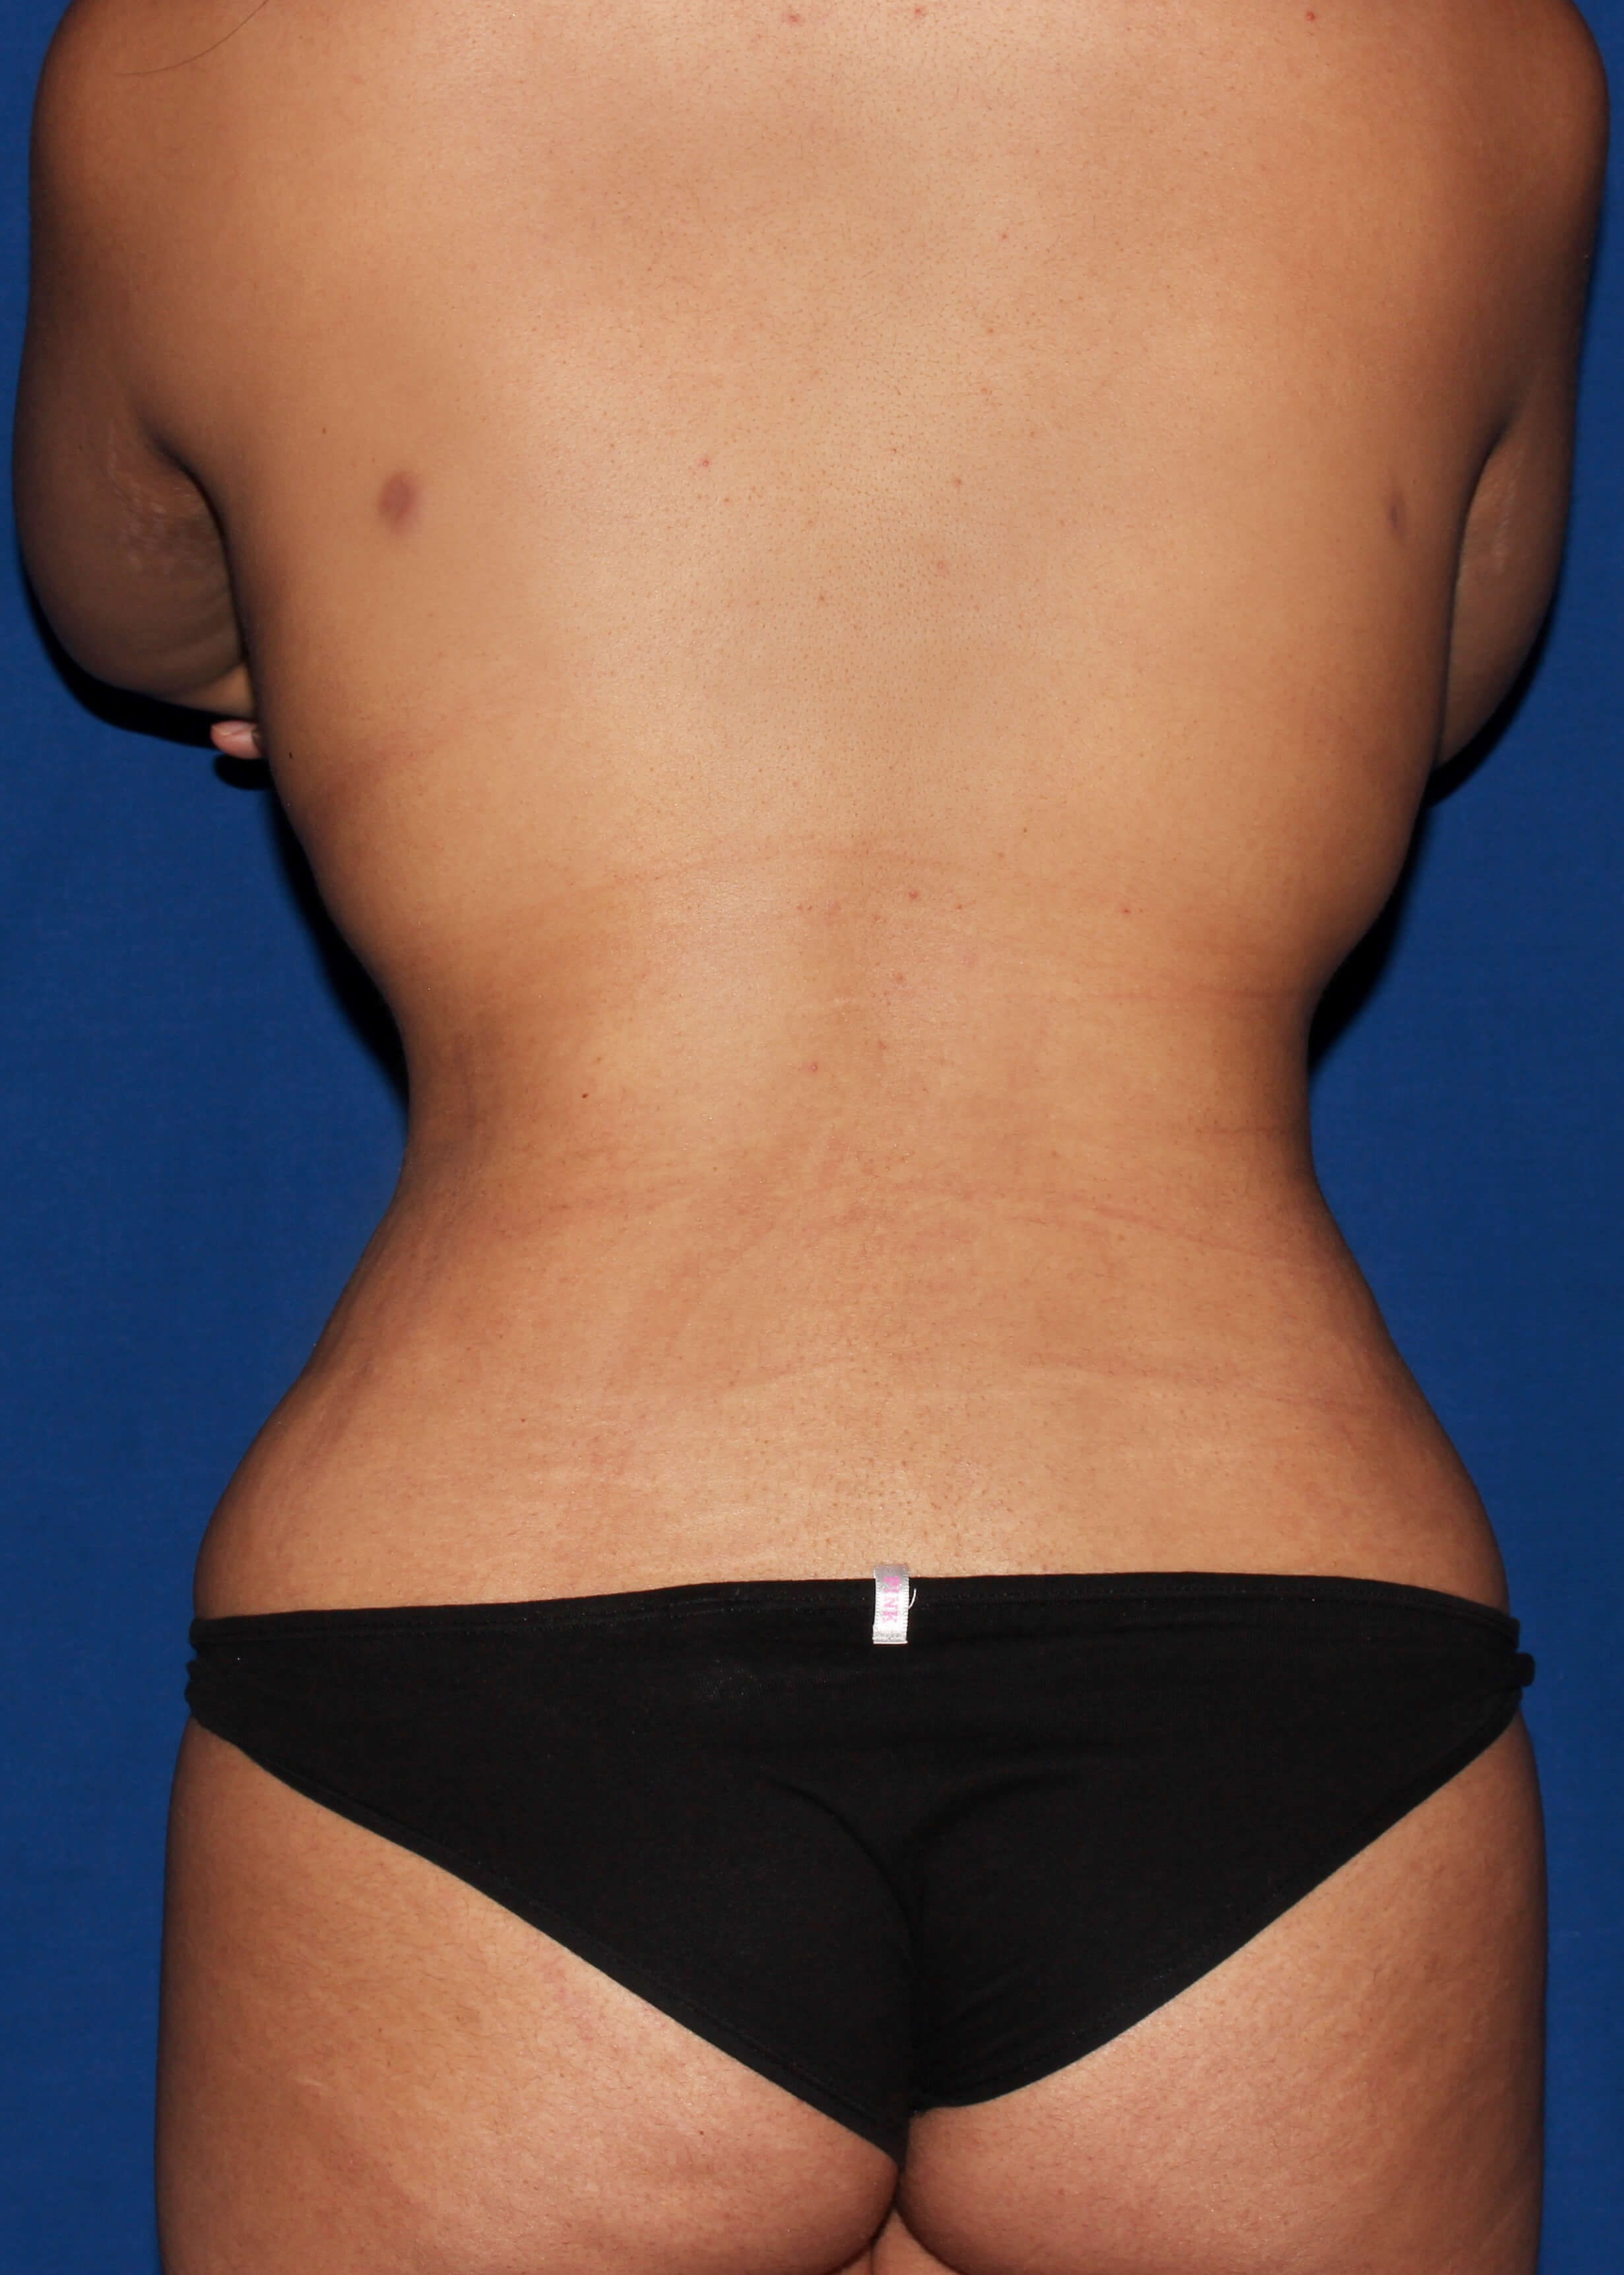 After Liposuction - scottsdale snatchted waist AZ